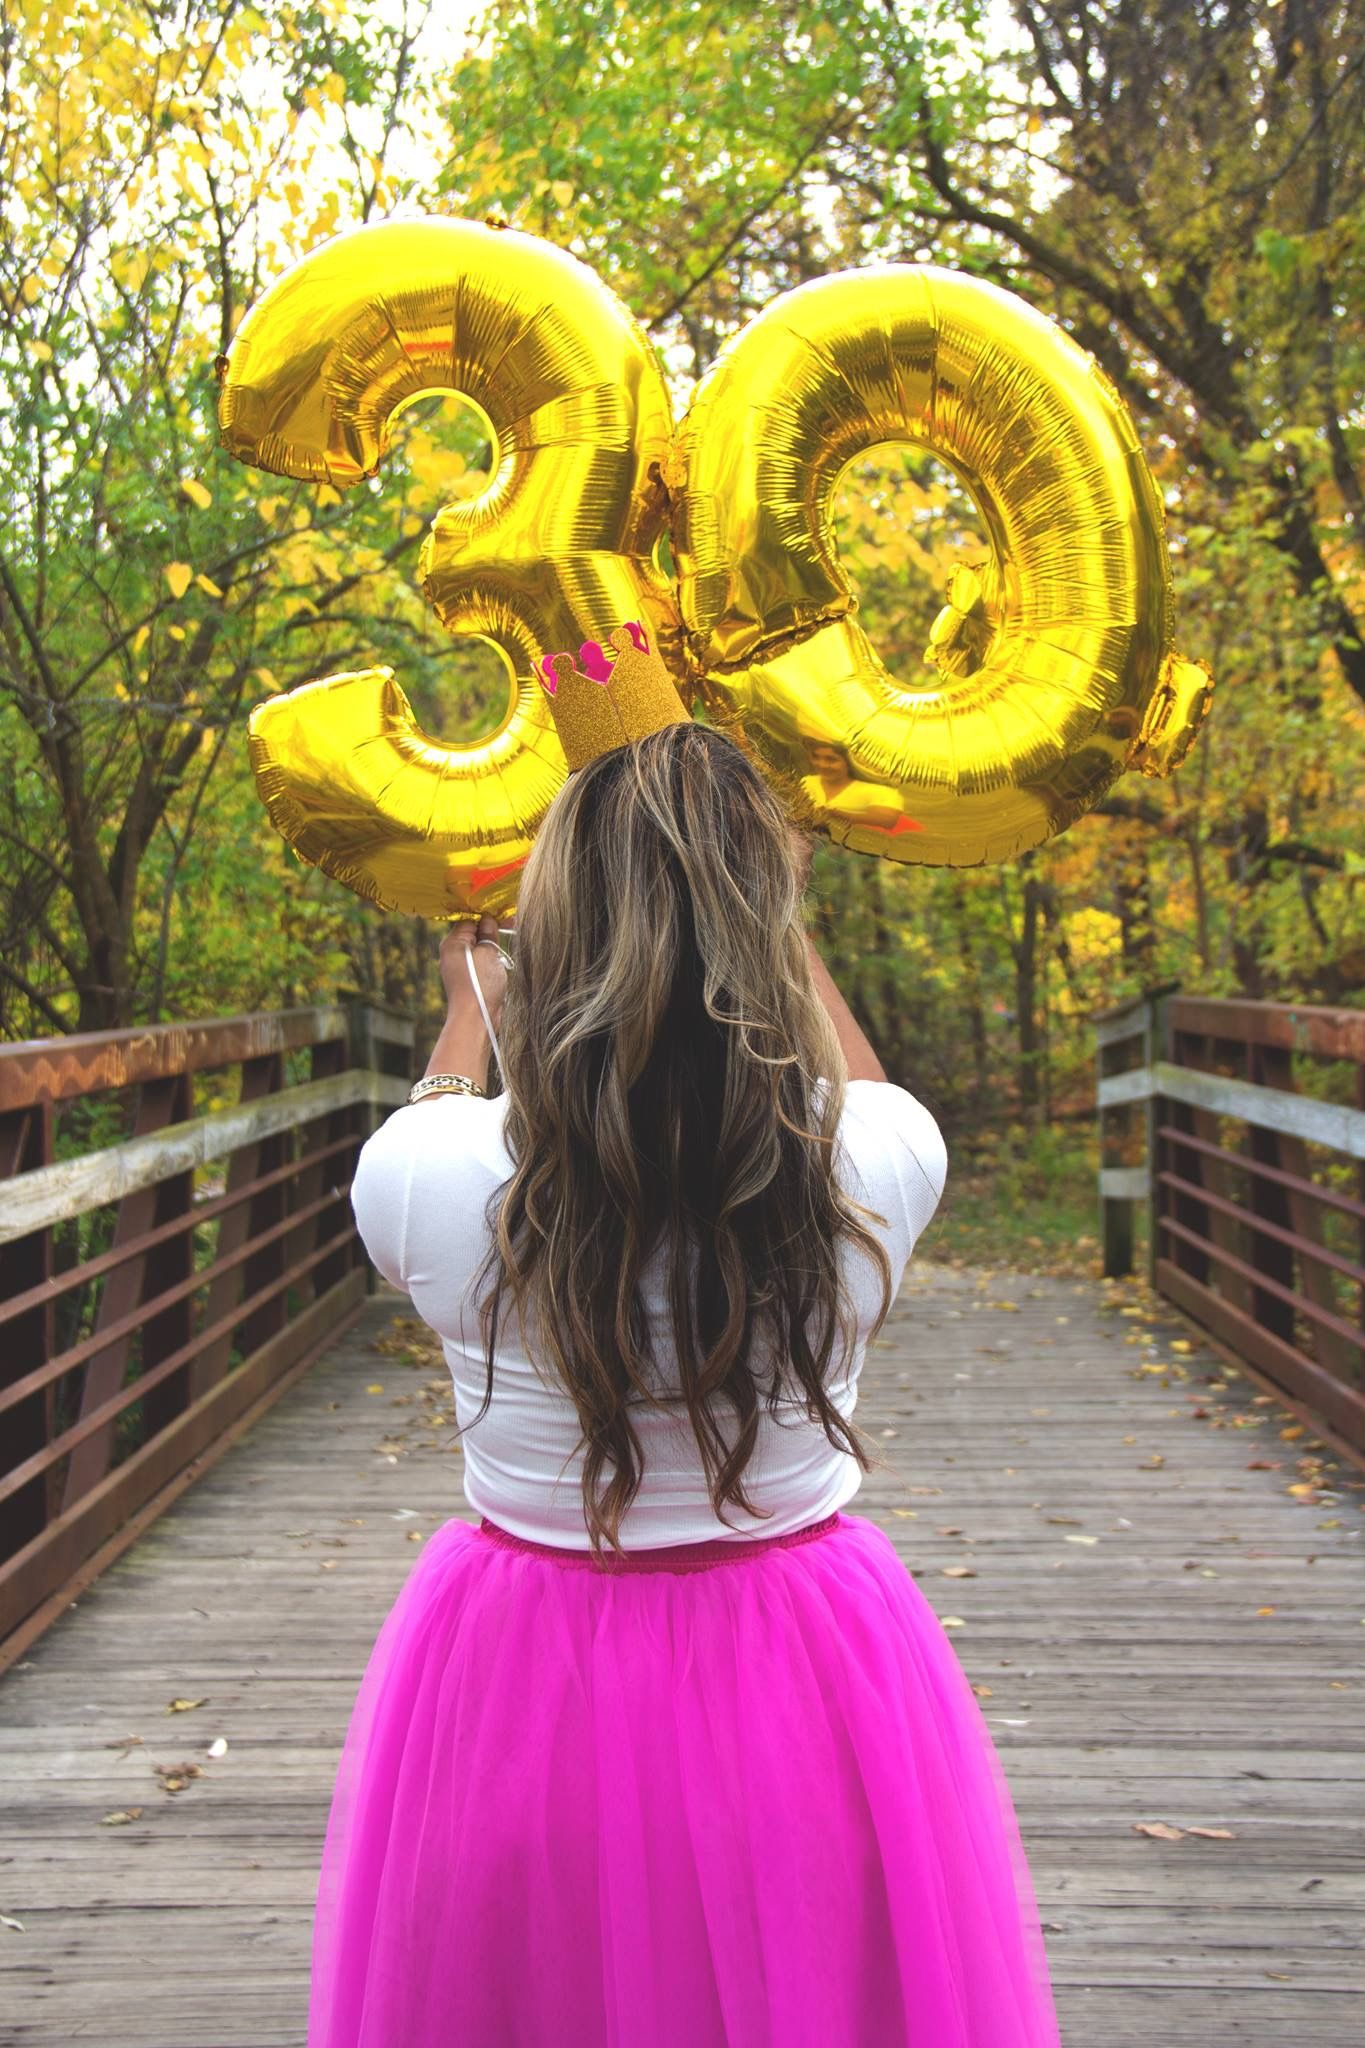 30th birthday photo shoot 21st birthdays cake - 30 cumpleanos ideas ...